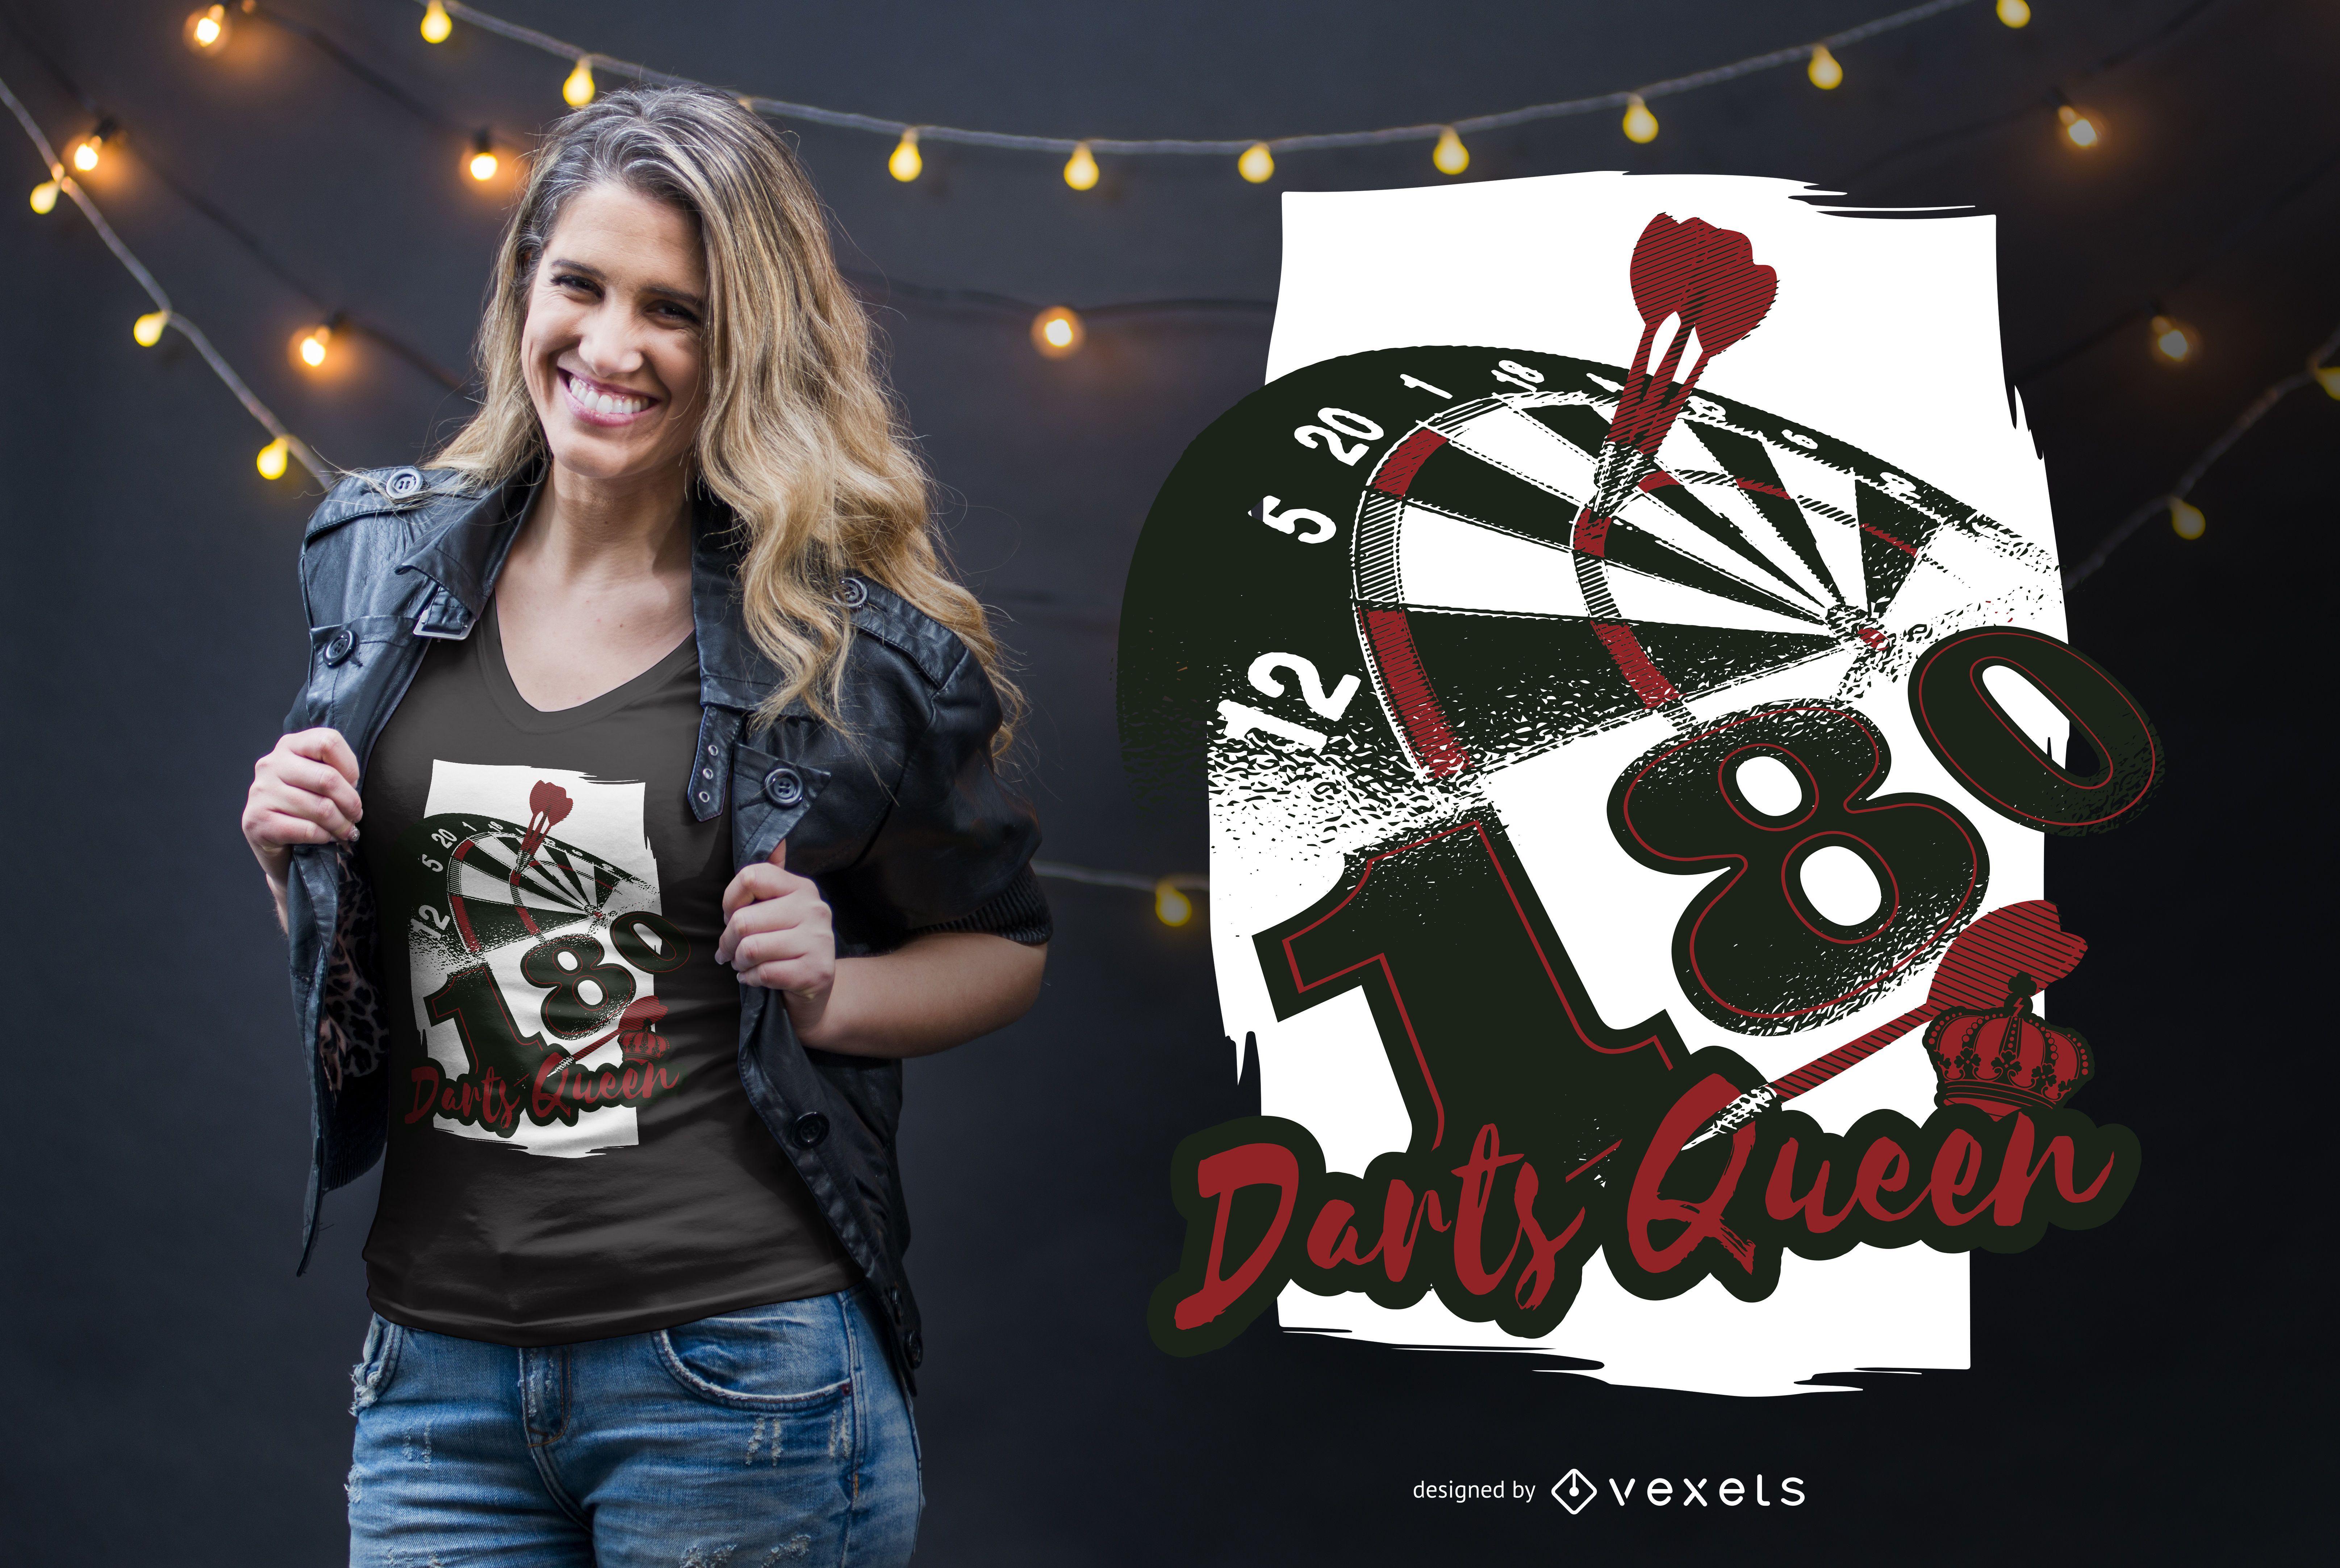 Darts Queen T-shirt Design